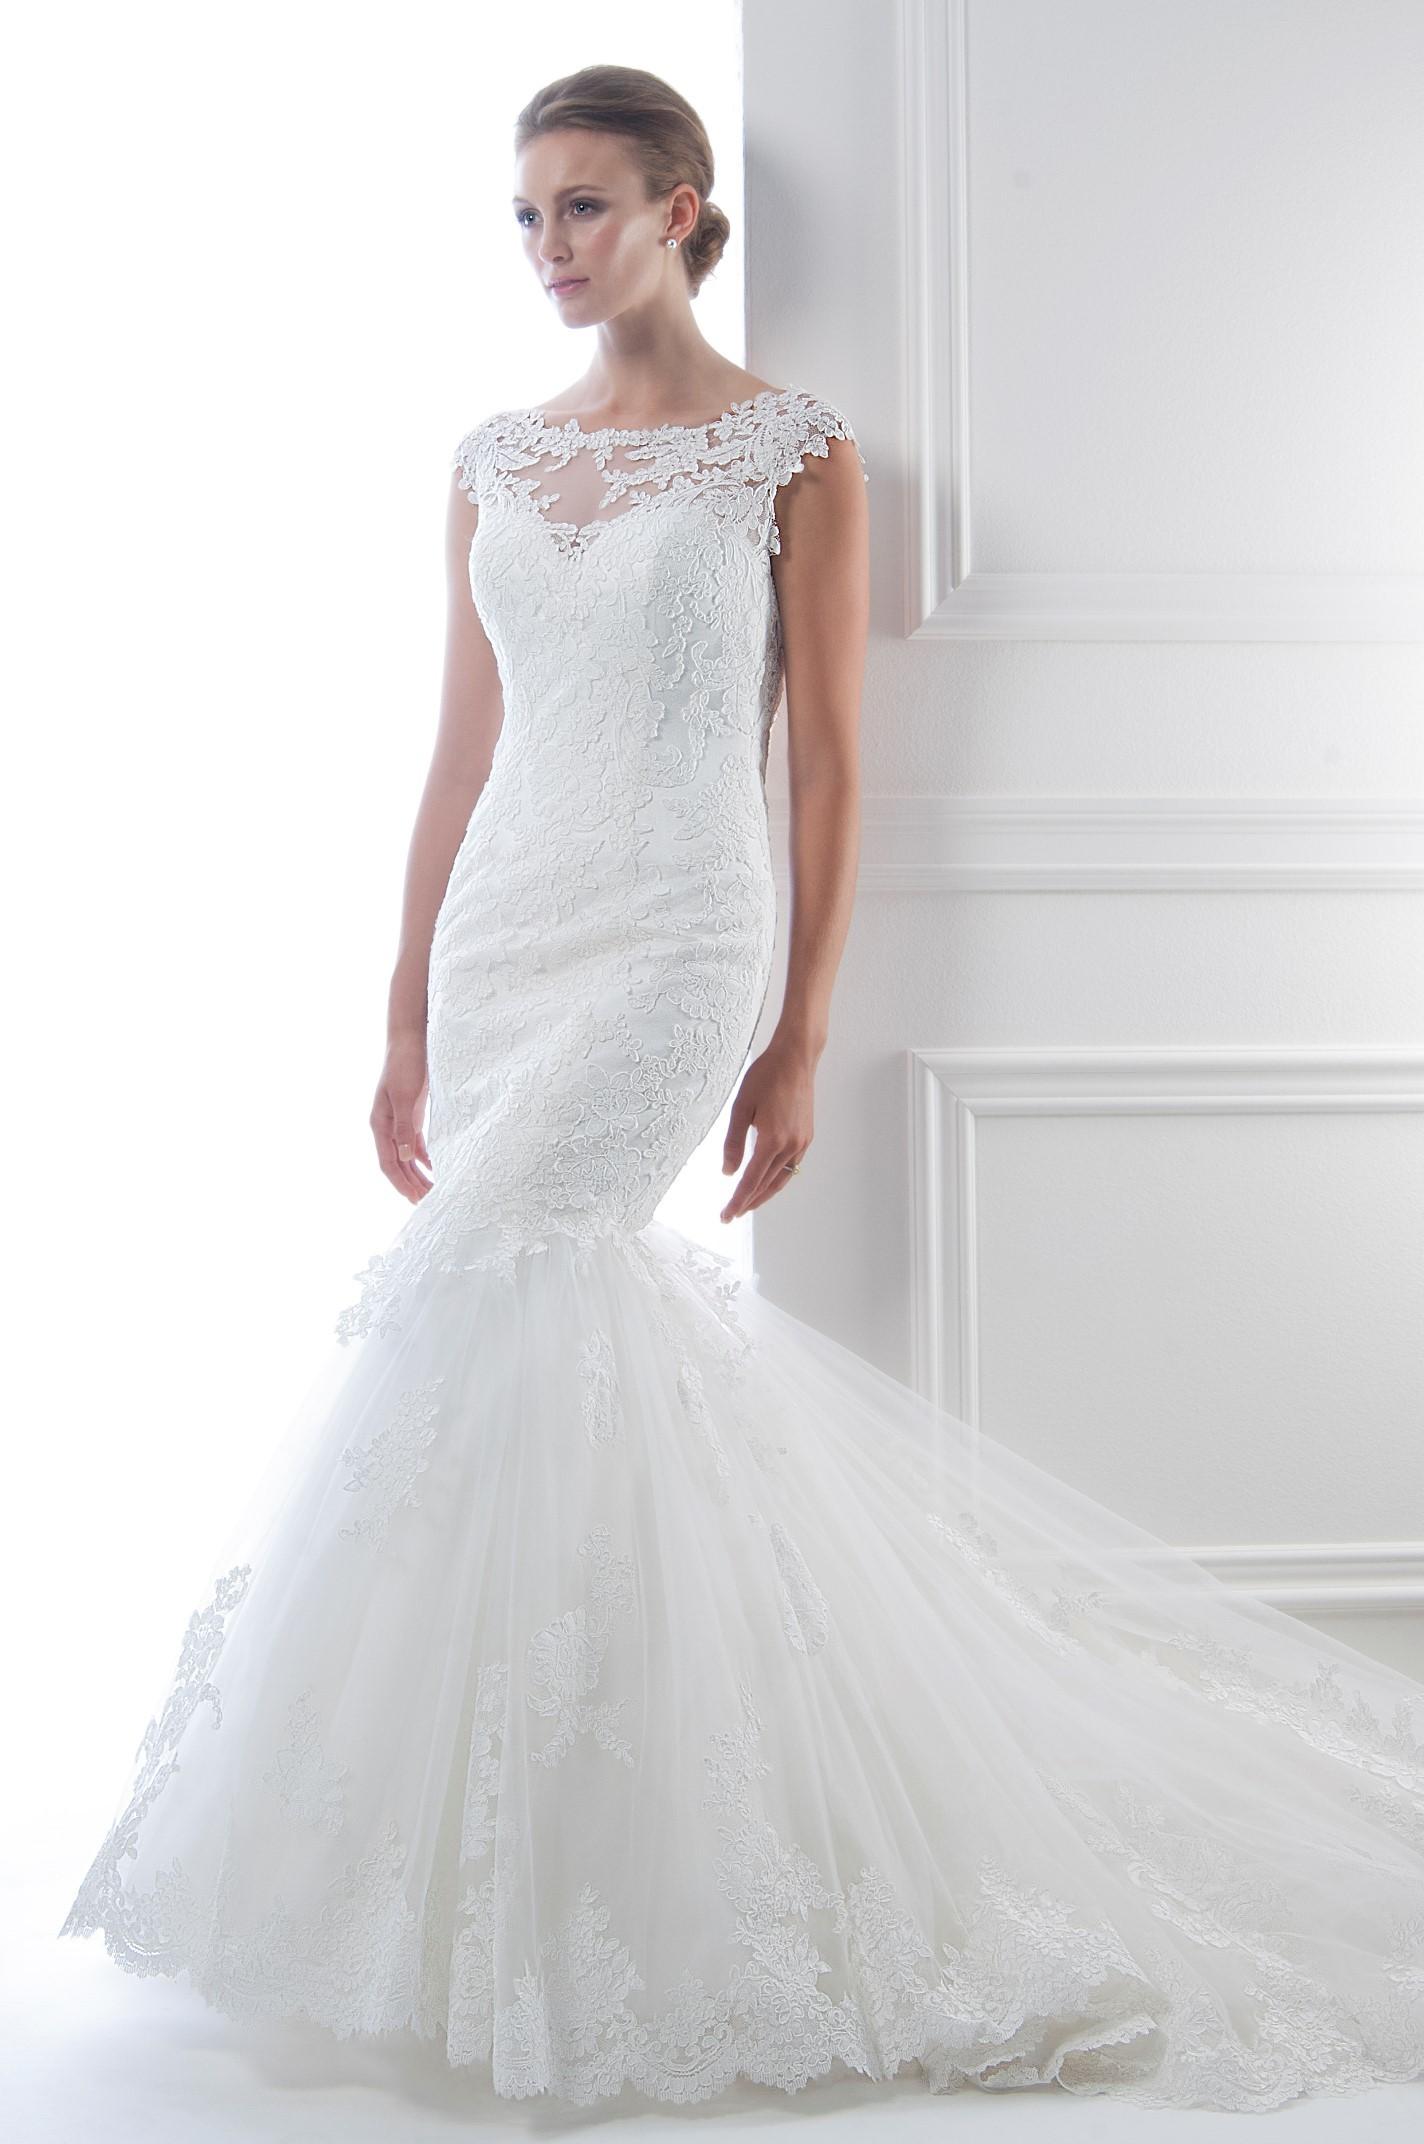 dress alfred sung fall 2013 bridal 6932 alfredsung bridal. Black Bedroom Furniture Sets. Home Design Ideas